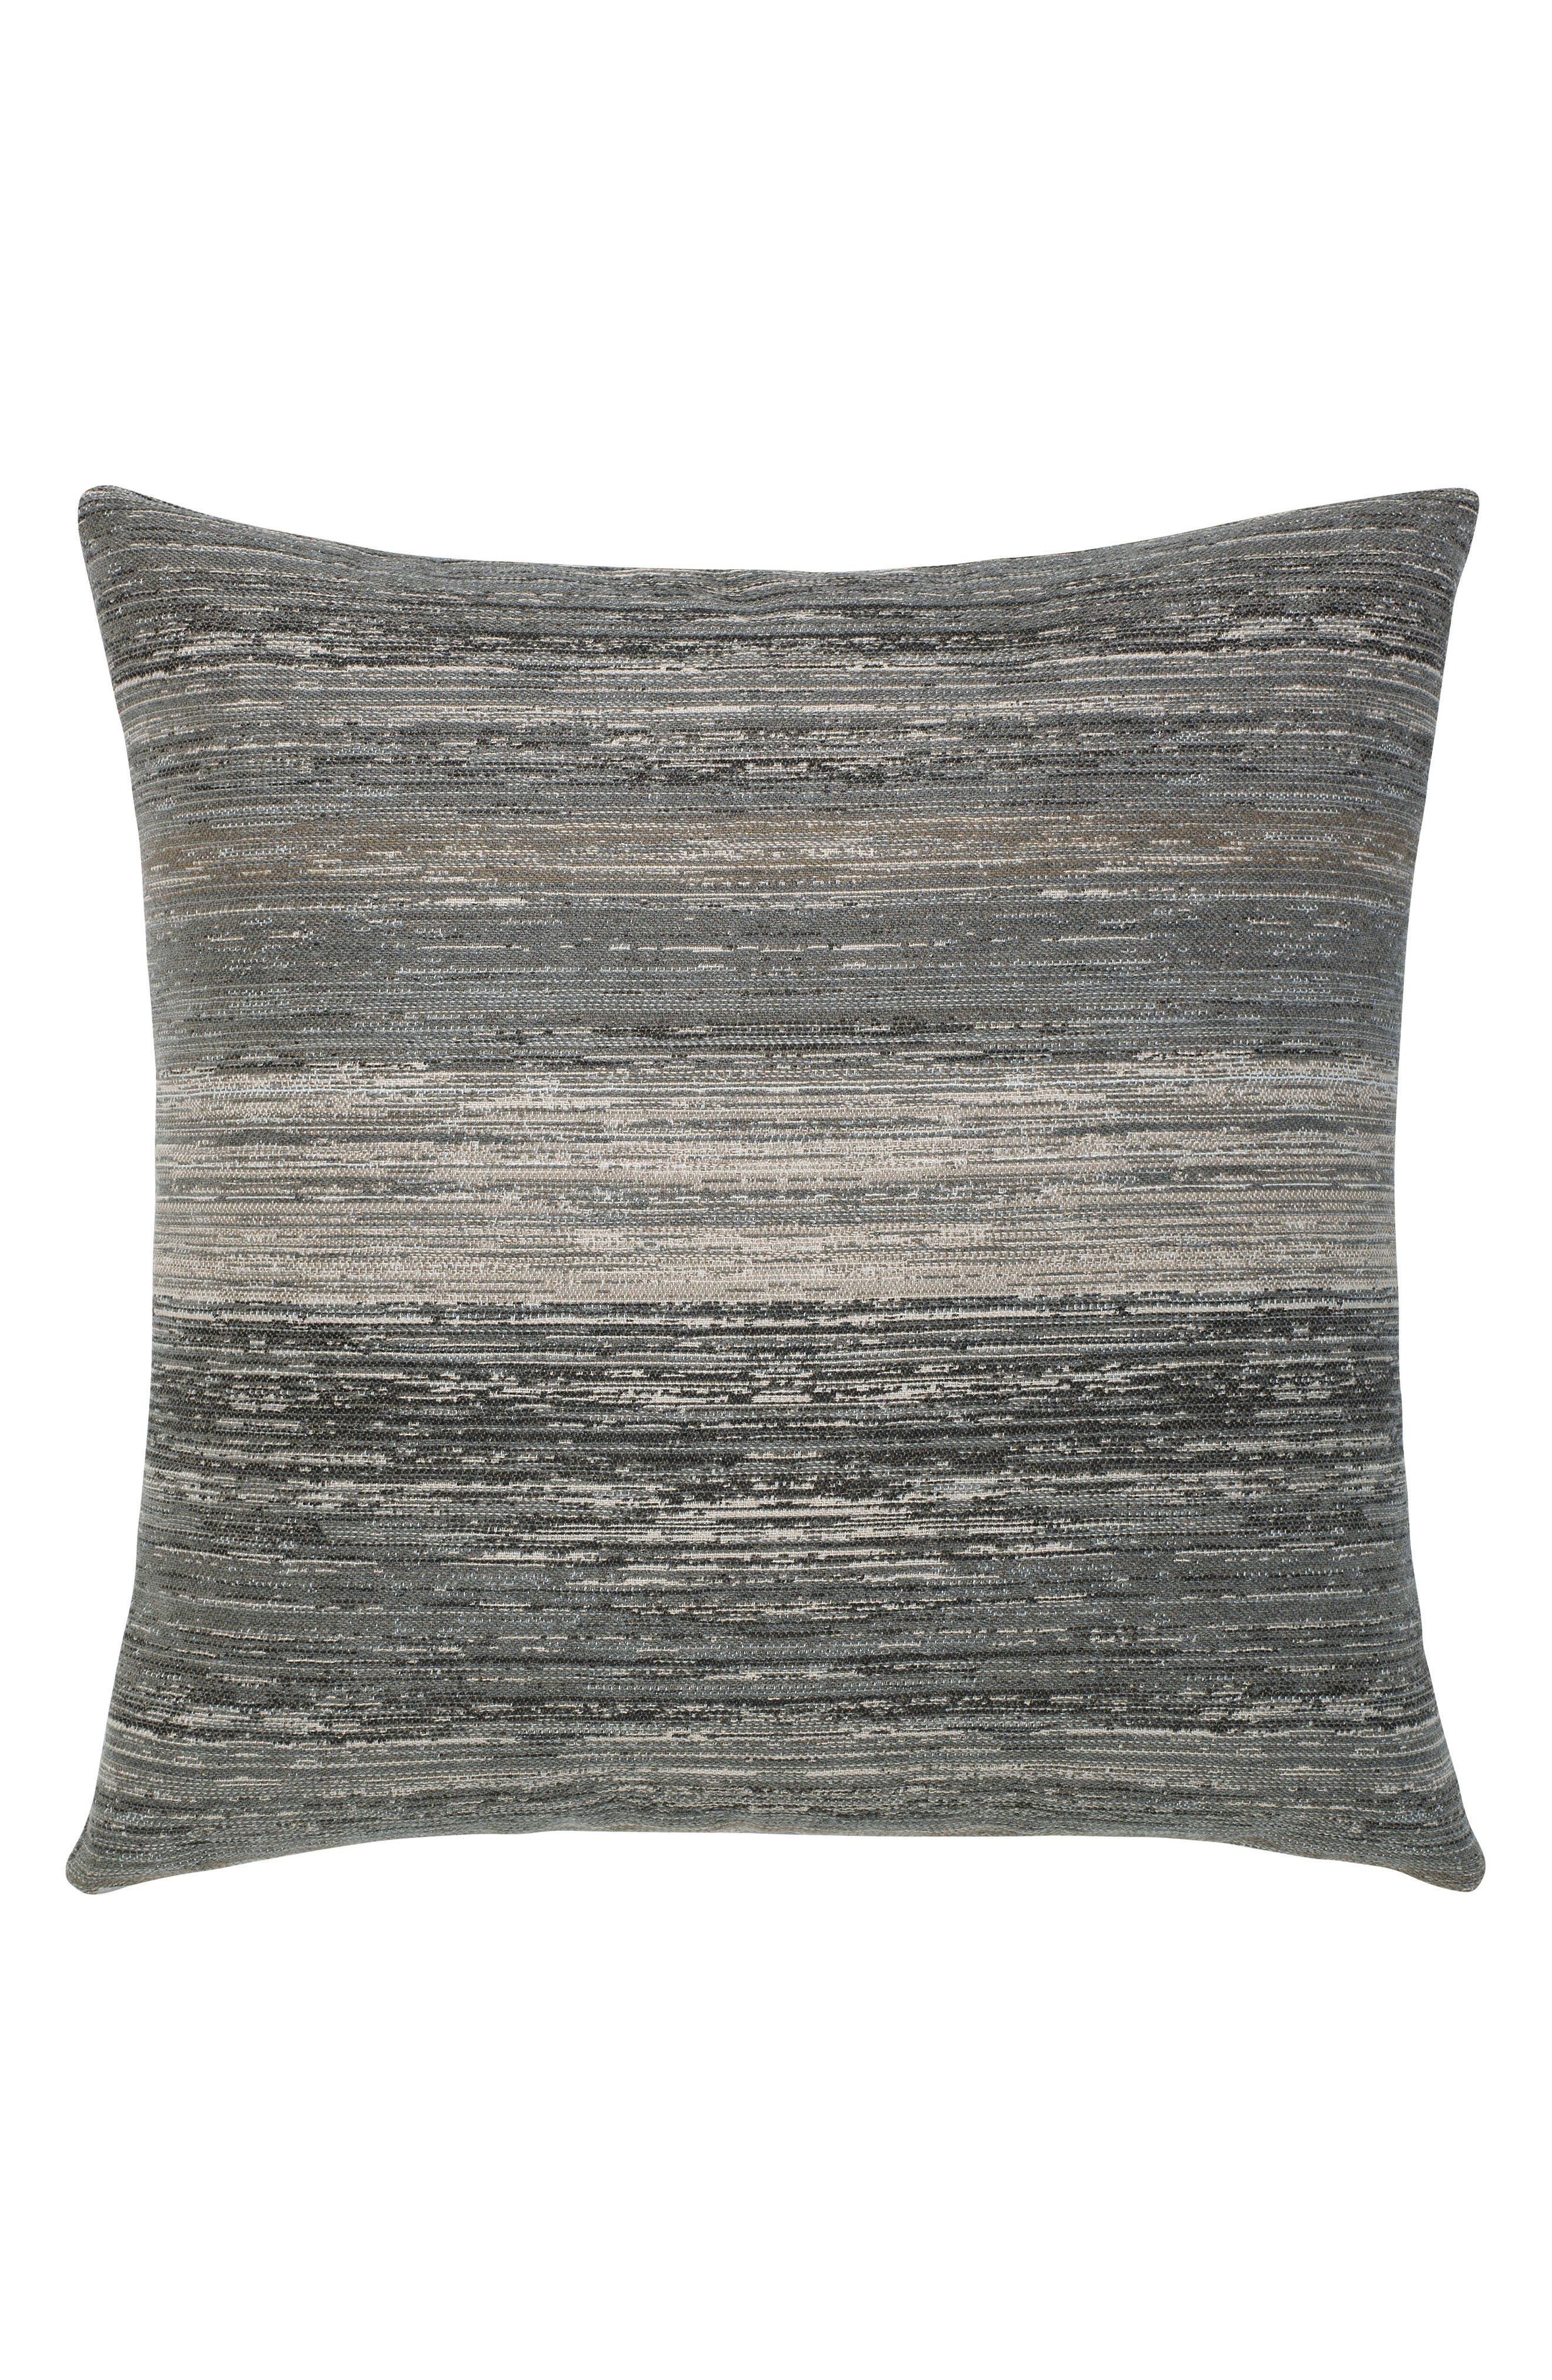 Elaine Smith Textured Grigio Indoor/Outdoor Accent Pillow